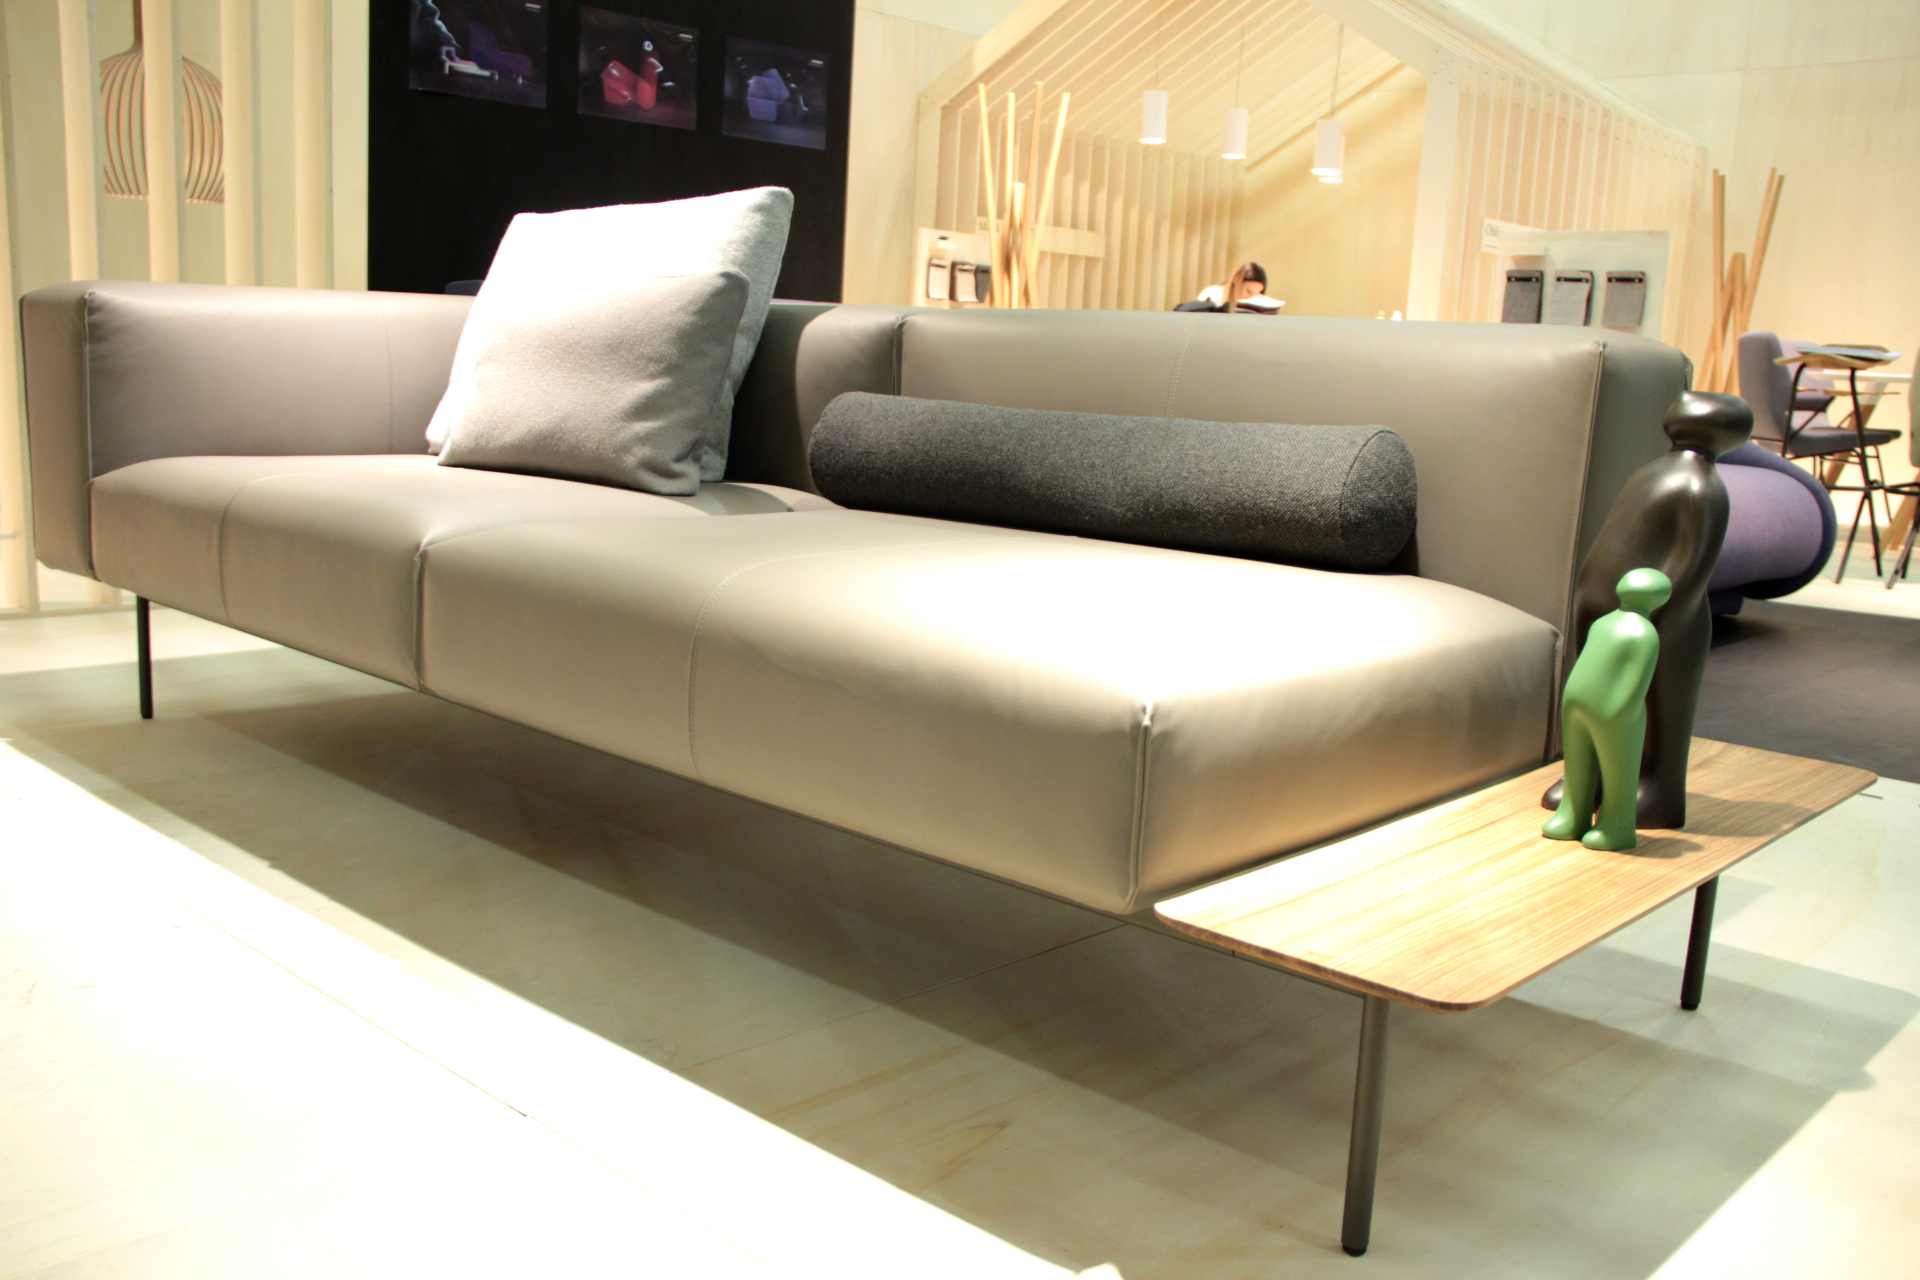 Prostoria imm 2016 living wohndesign for 1 living wohndesign